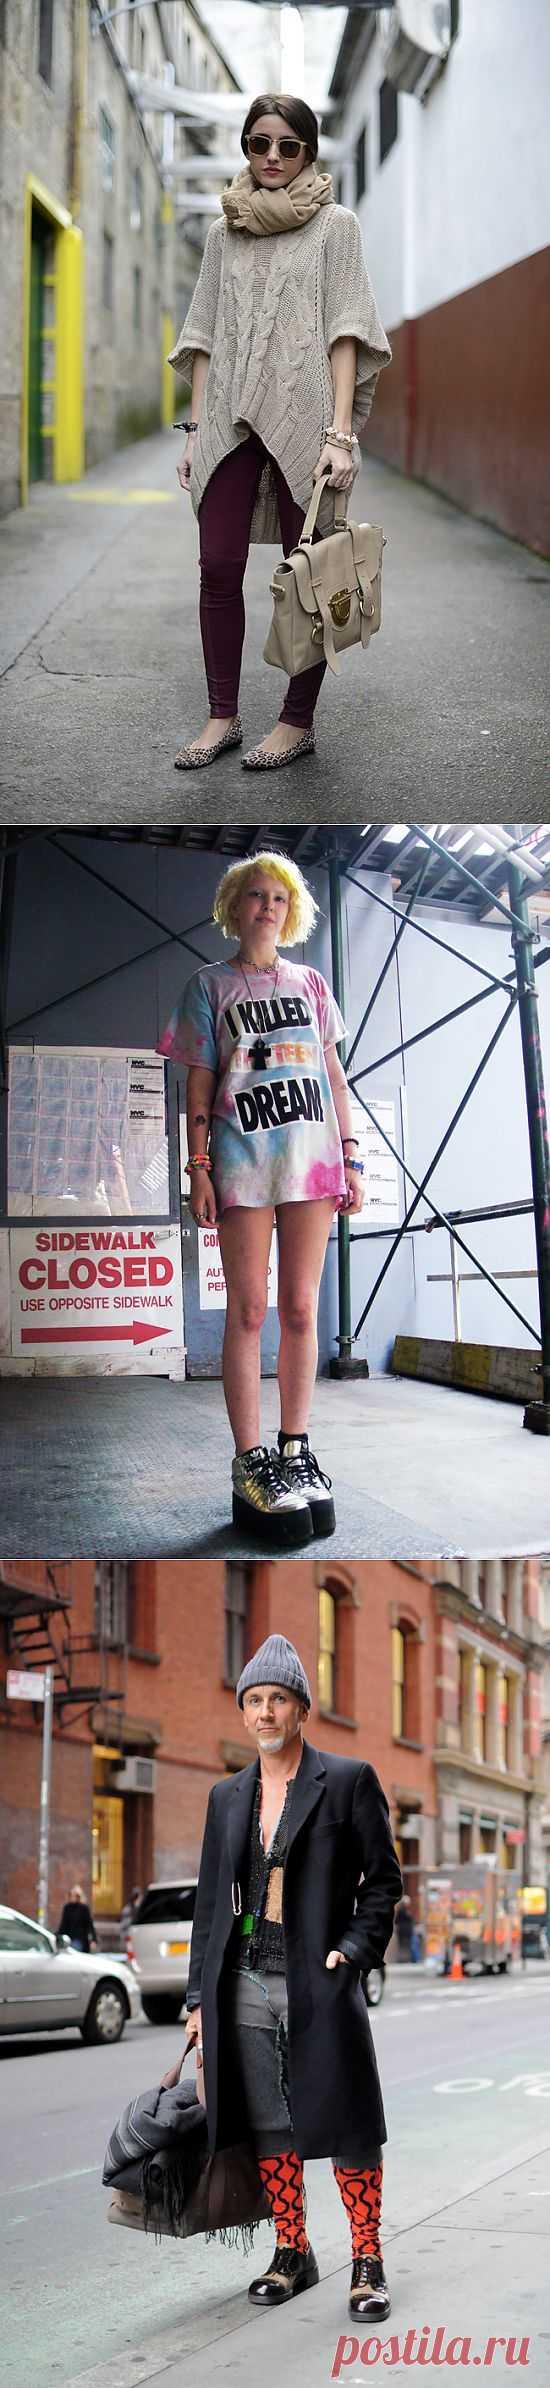 Street style (трафик) / Street Style / Модный сайт о стильной переделке одежды и интерьера